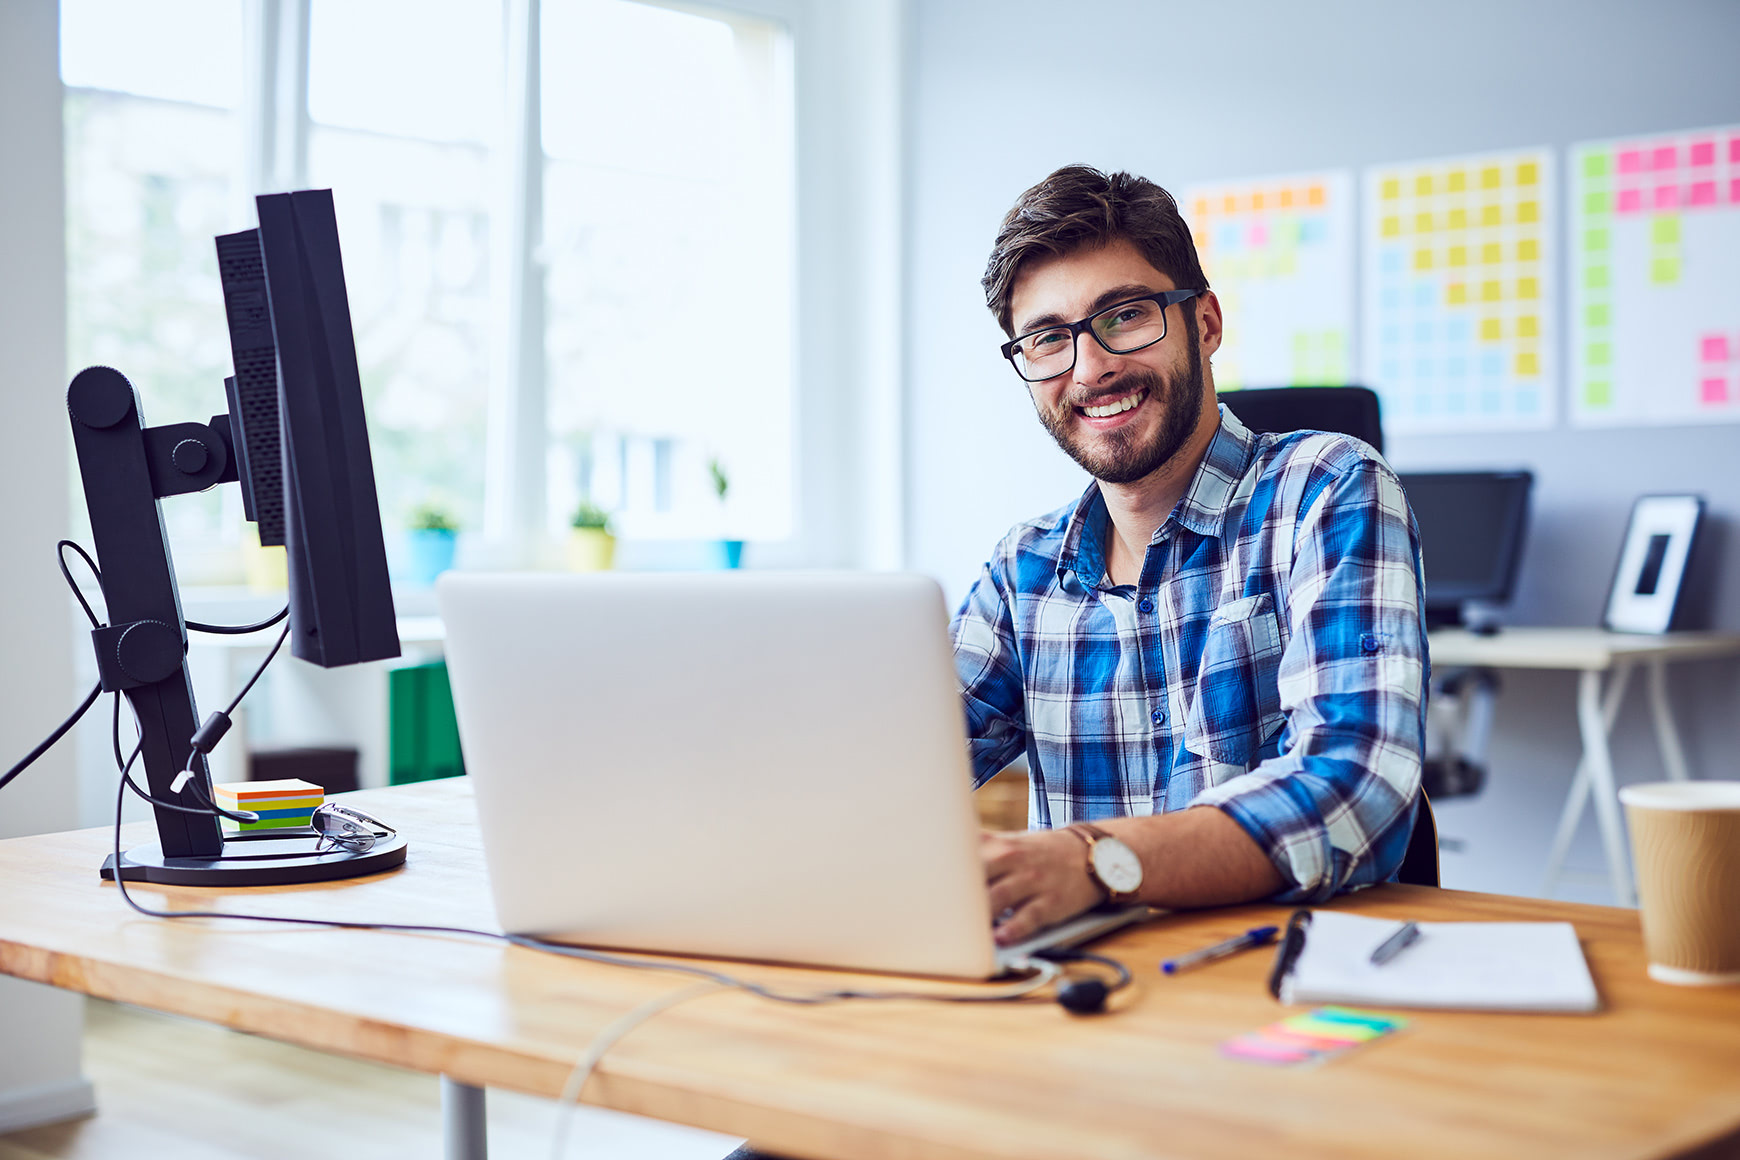 man smiling with laptop